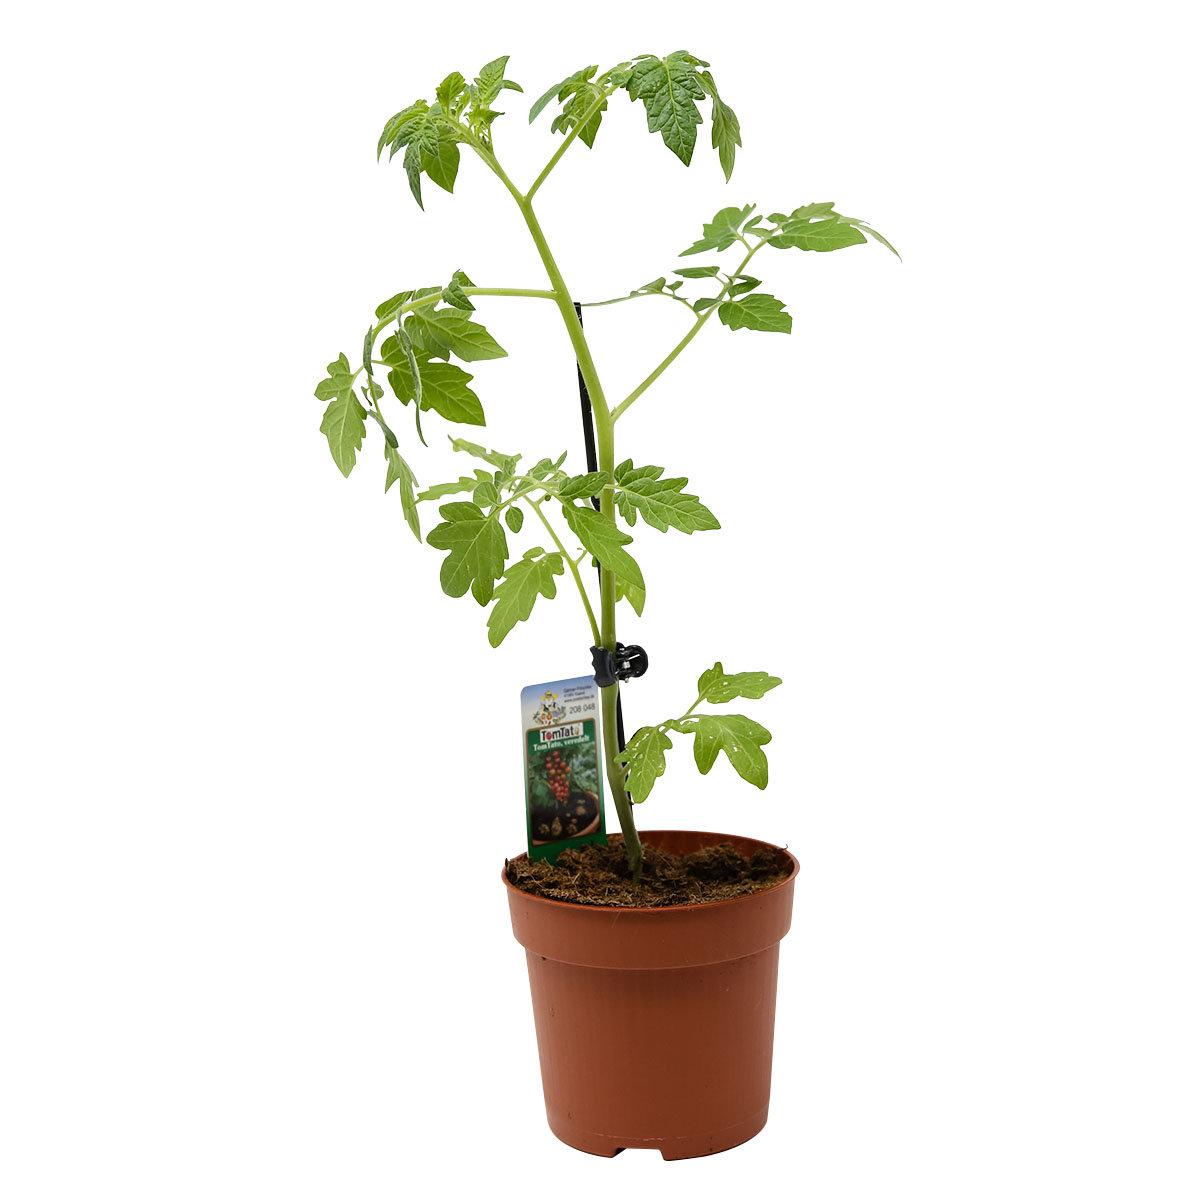 tomaten kartoffelpflanze tomtato veredelt von g rtner. Black Bedroom Furniture Sets. Home Design Ideas